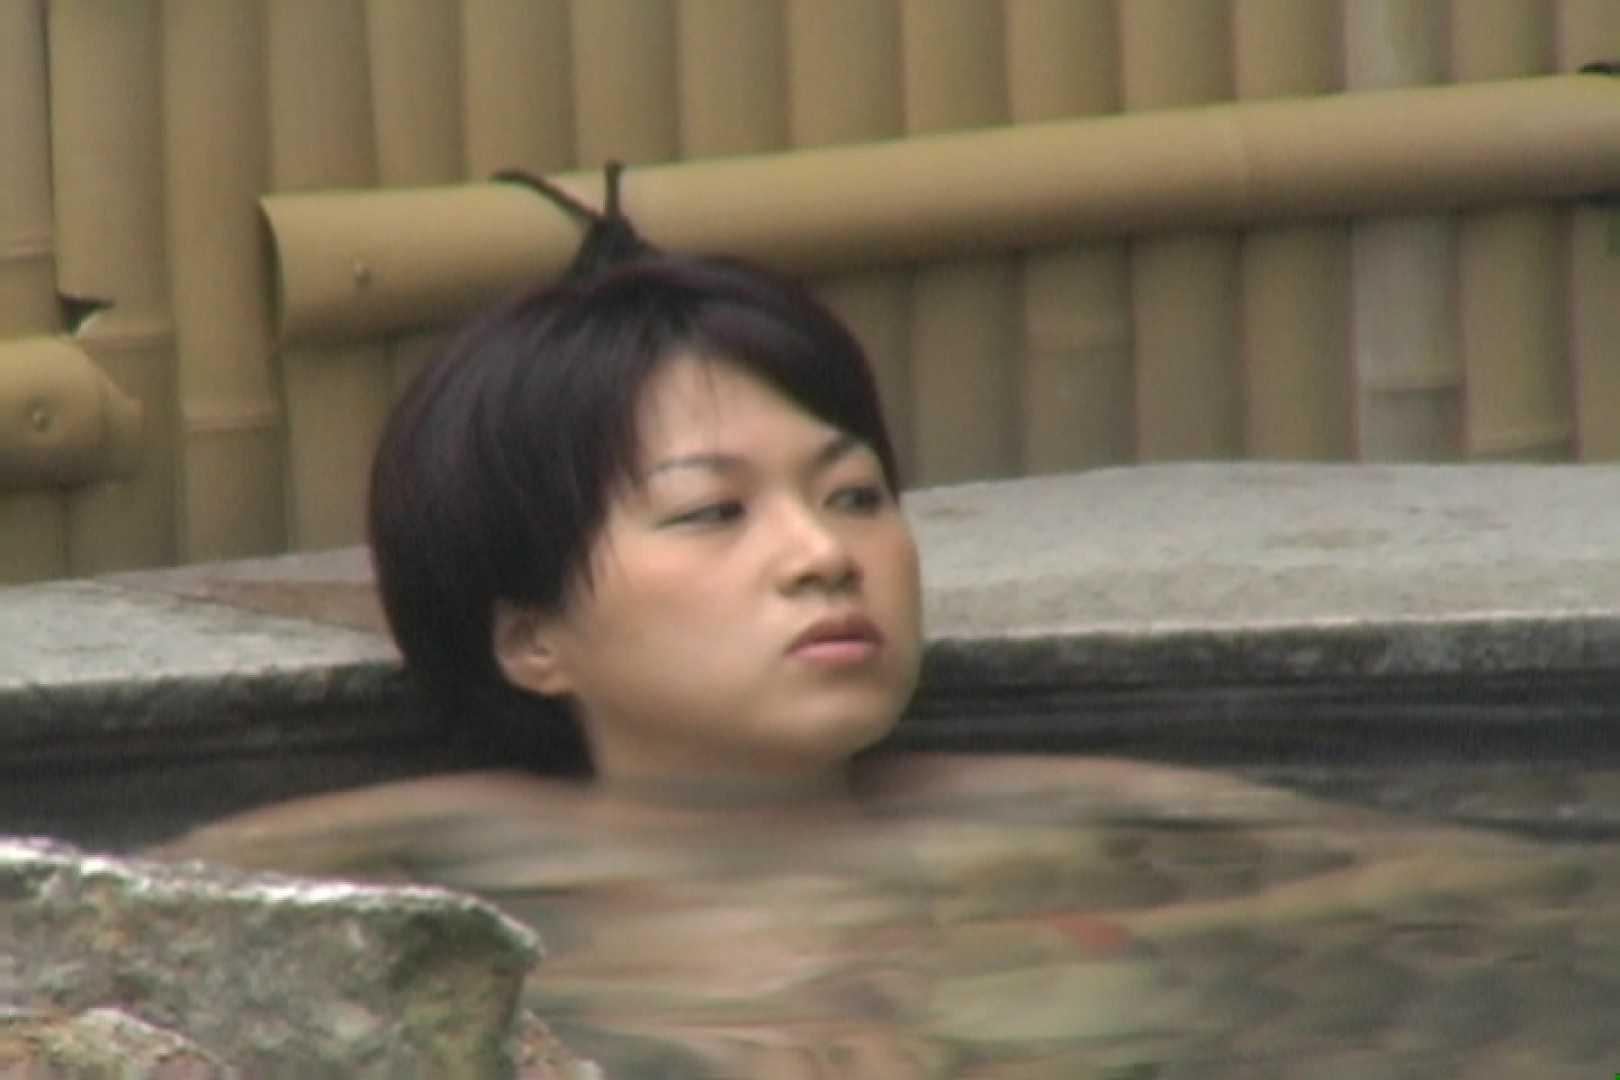 Aquaな露天風呂Vol.624 露天風呂編 | 盗撮シリーズ  88PIX 37